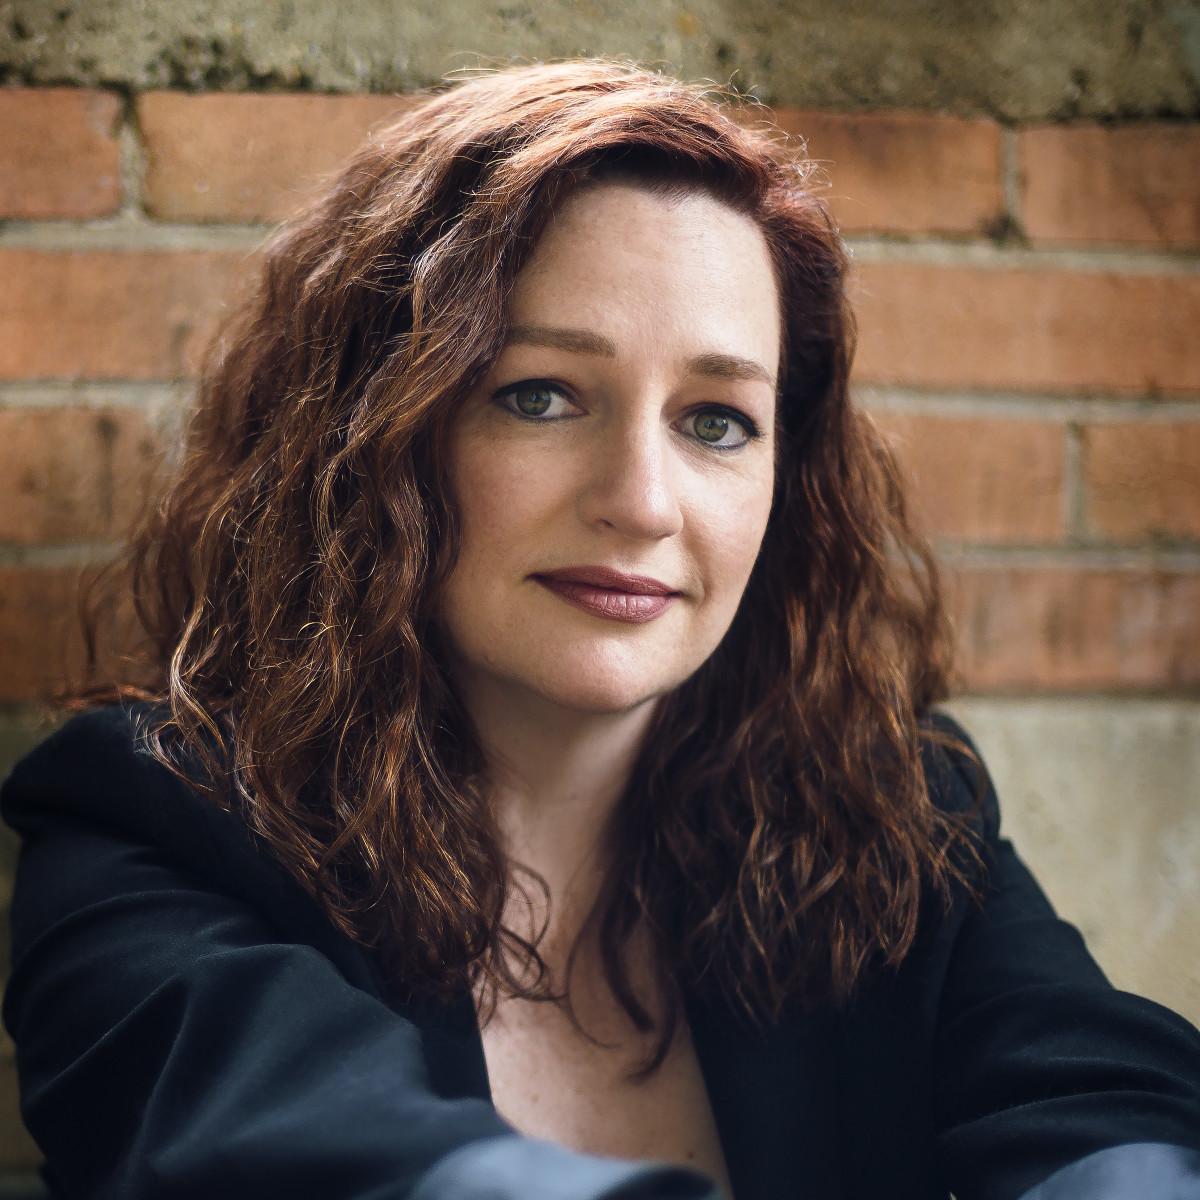 Jessica Cavanagh